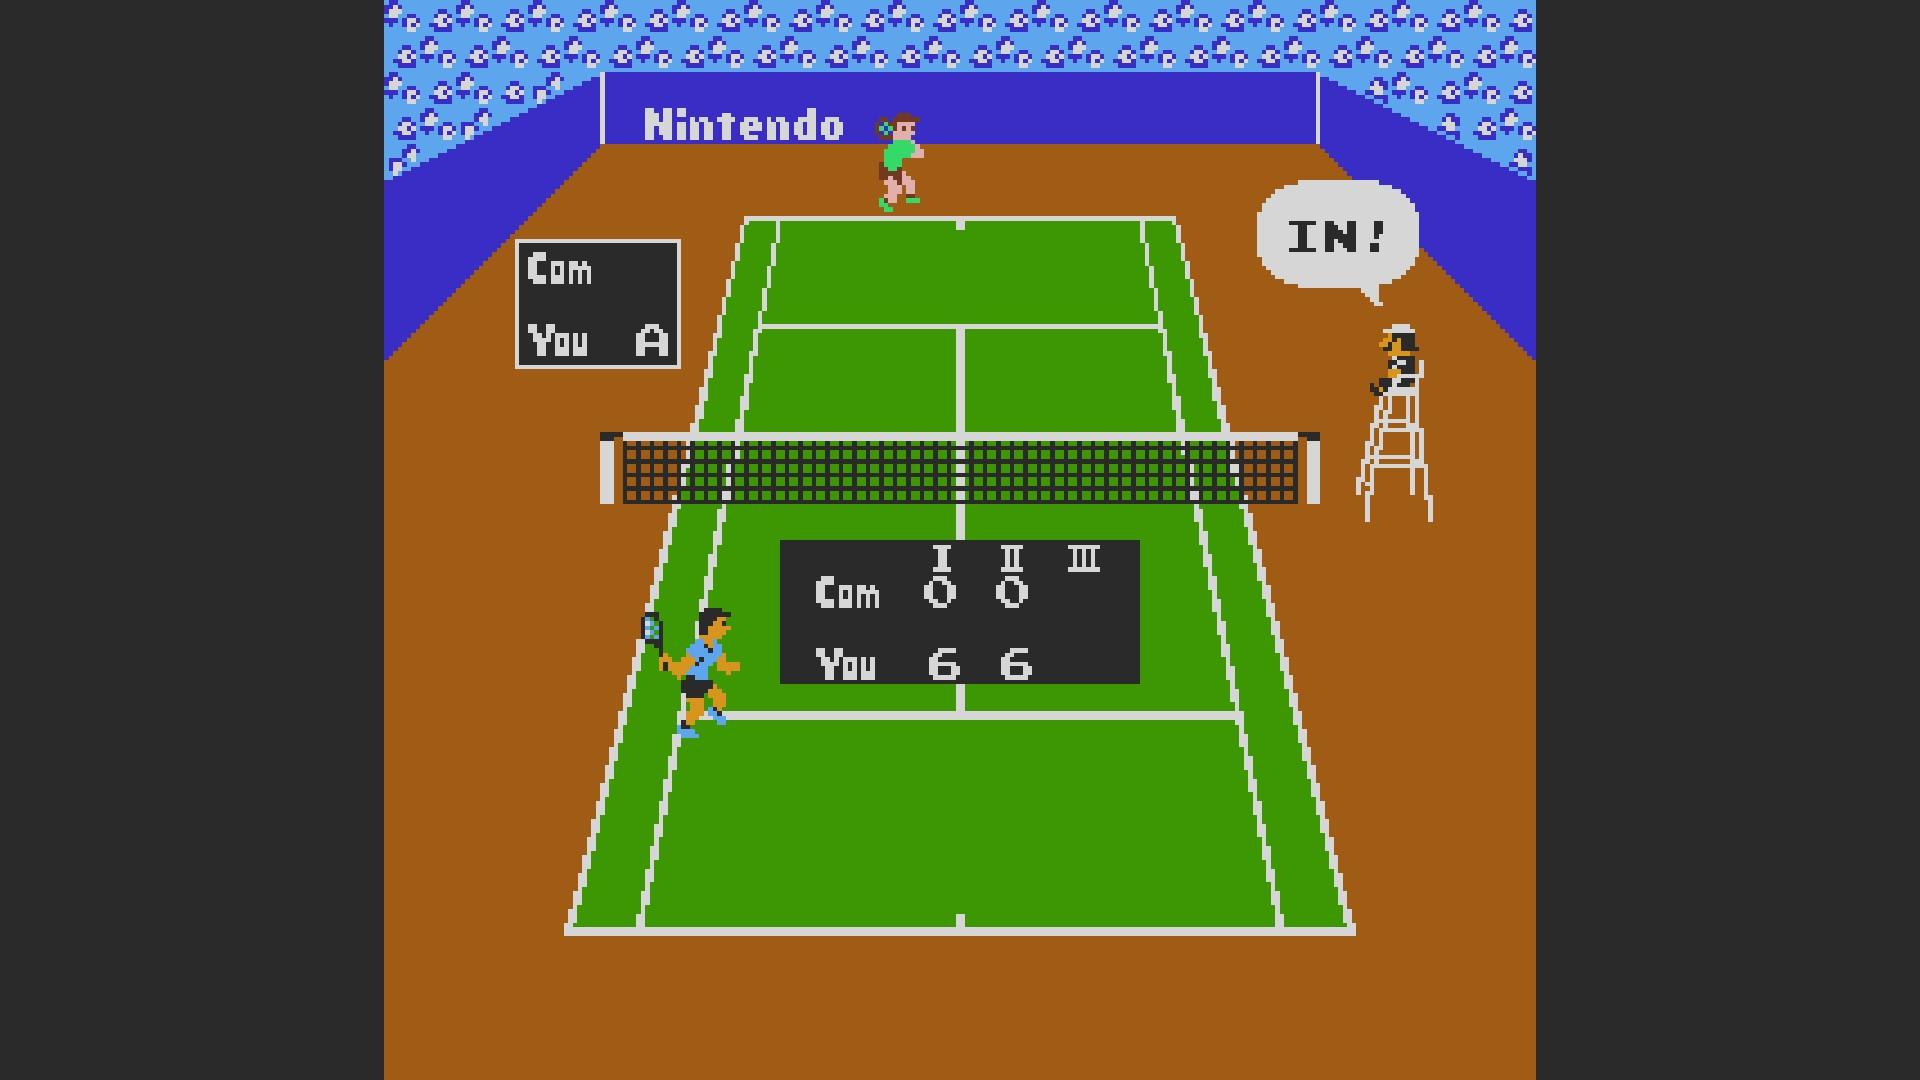 Tennis: Level 1 [Games Won] 24 points